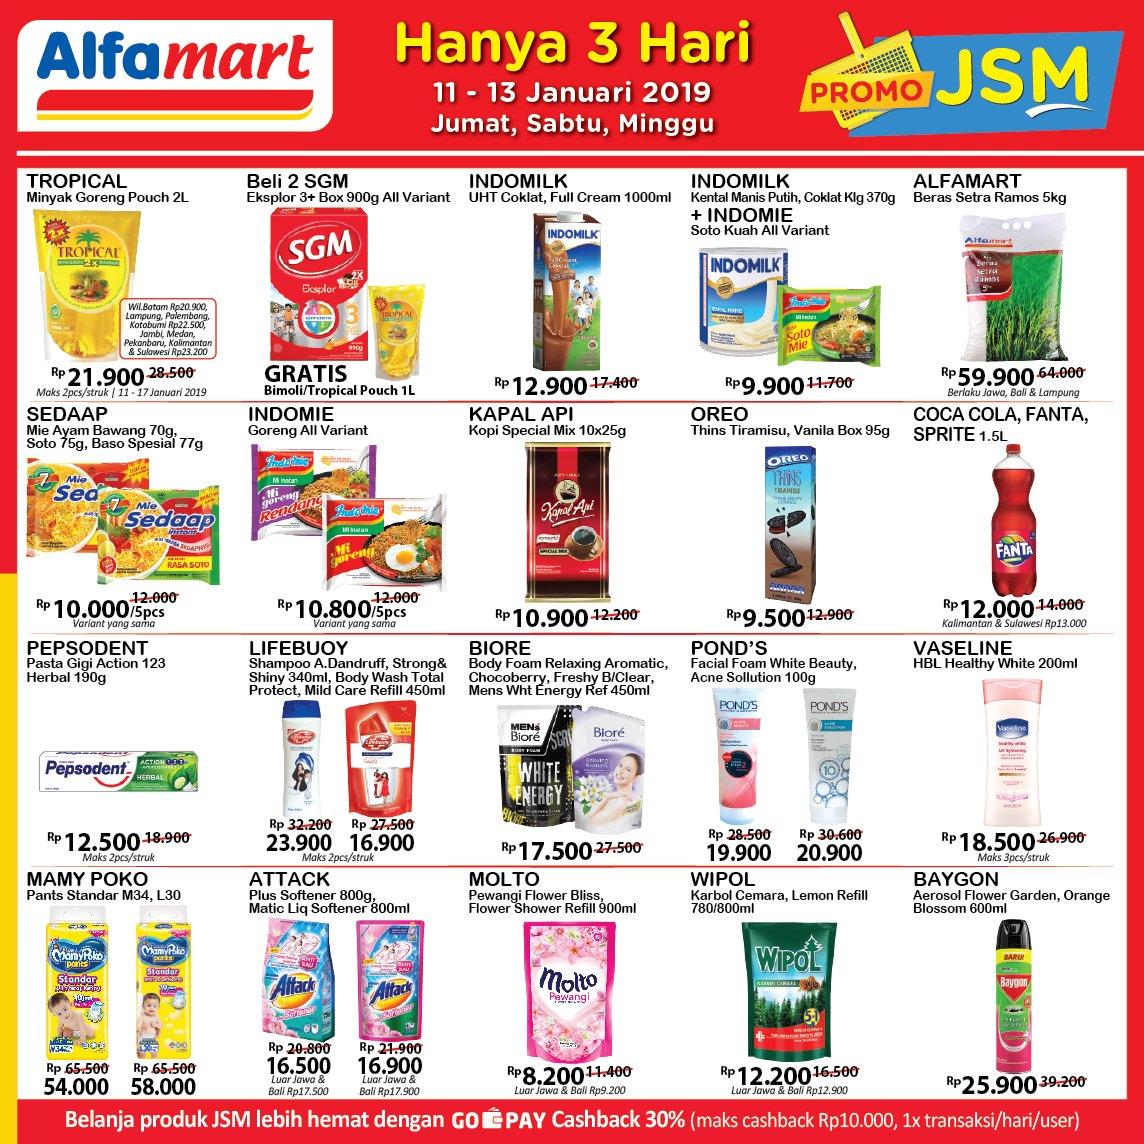 #Alfamart - #Promo #Katalog #JSM Periode 11 - 13 Januari 2019